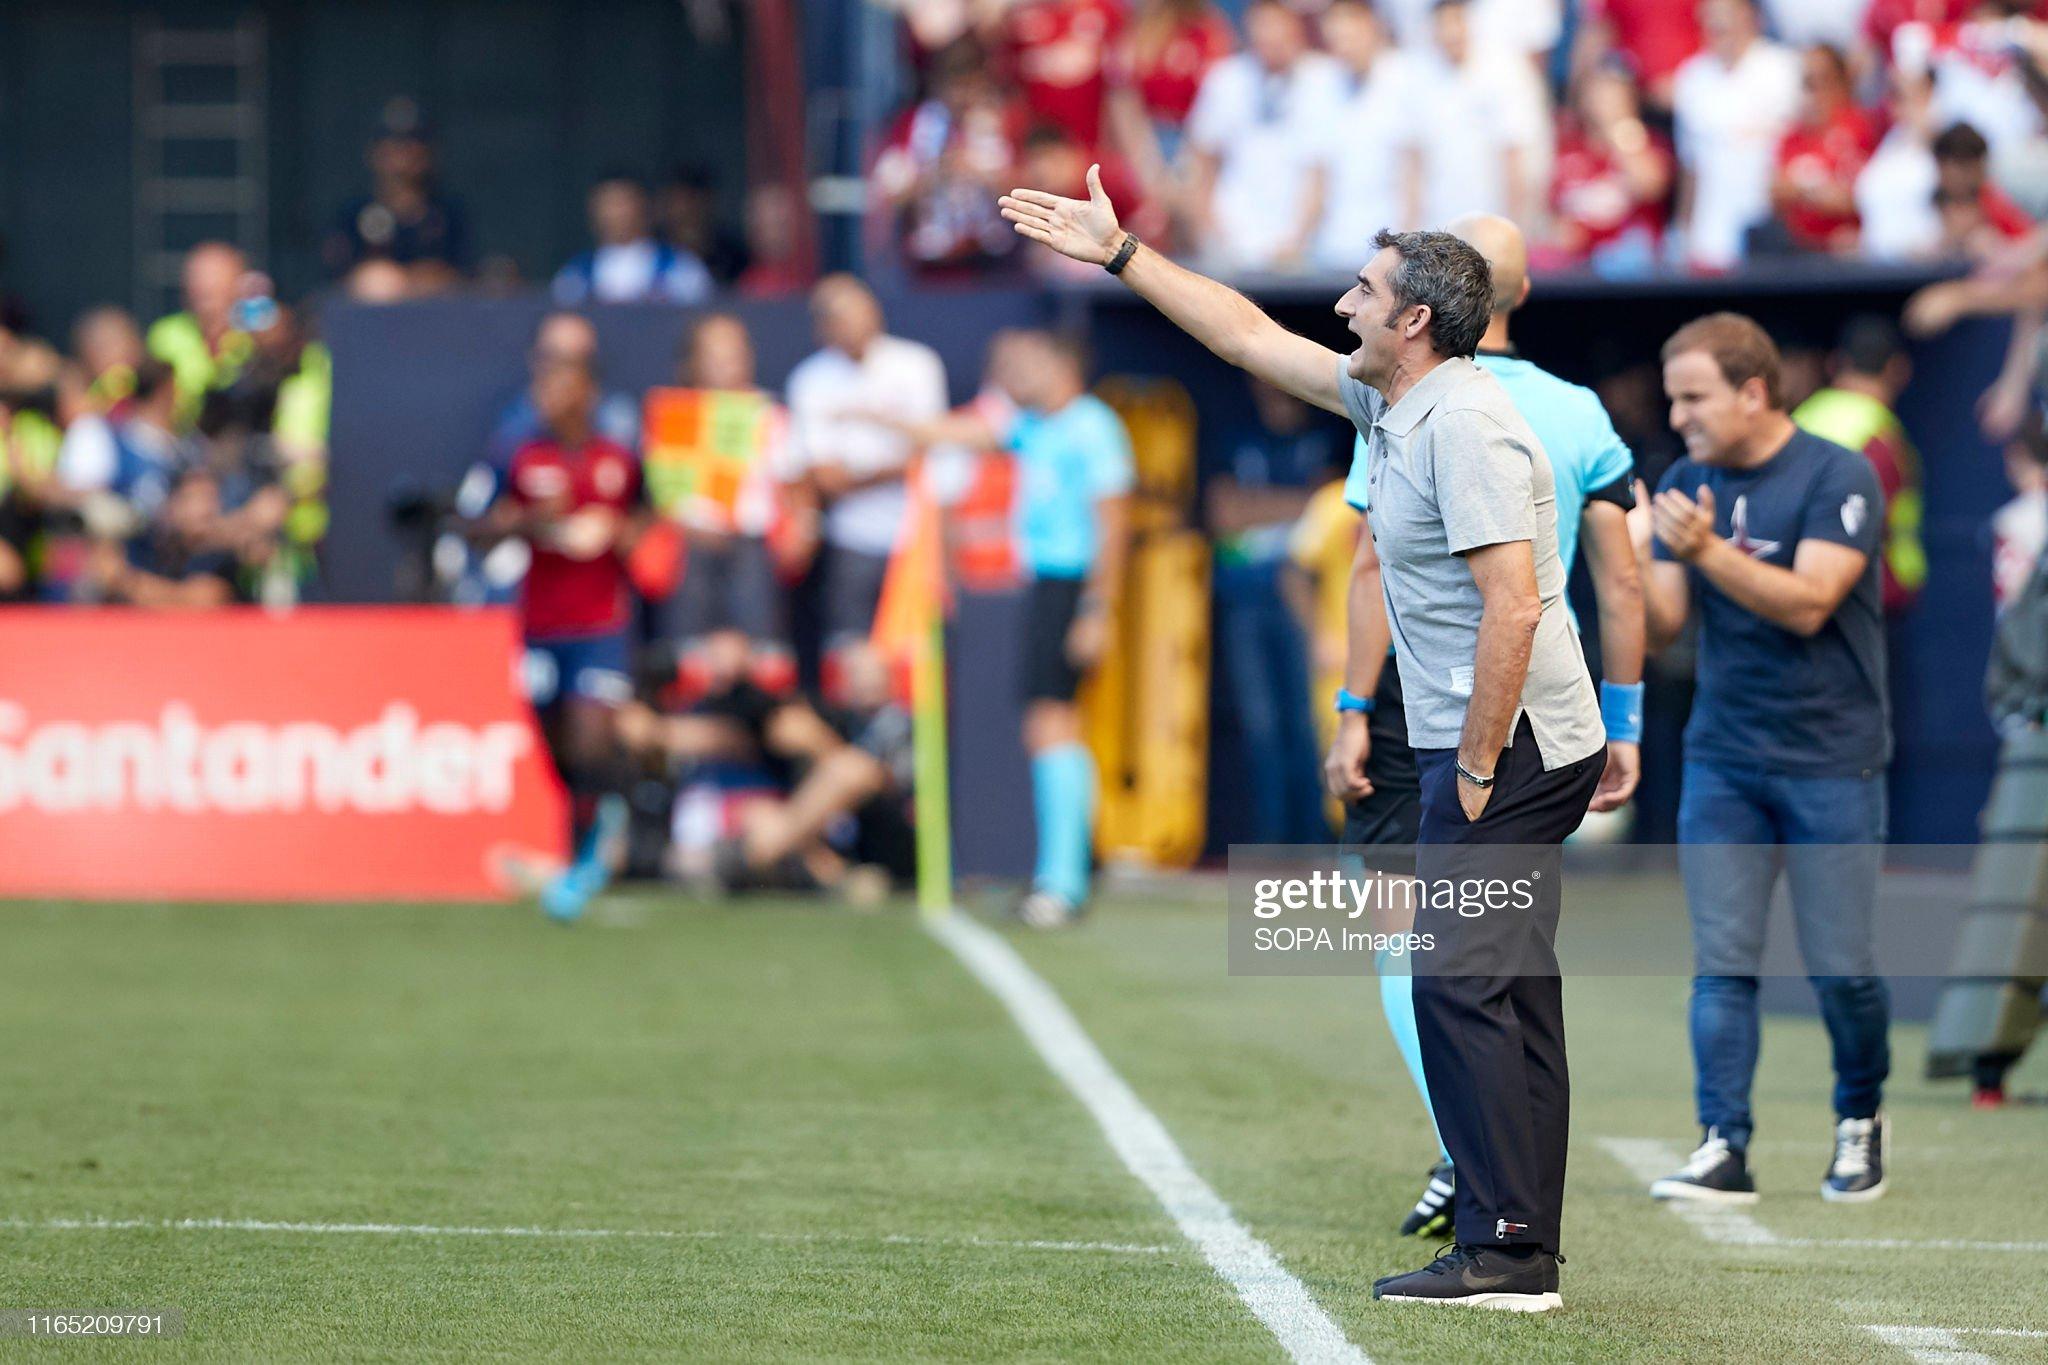 صور مباراة : أوساسونا - برشلونة 2-2 ( 31-08-2019 )  Ernesto-valverde-in-action-during-the-spanish-la-liga-santander-match-picture-id1165209791?s=2048x2048